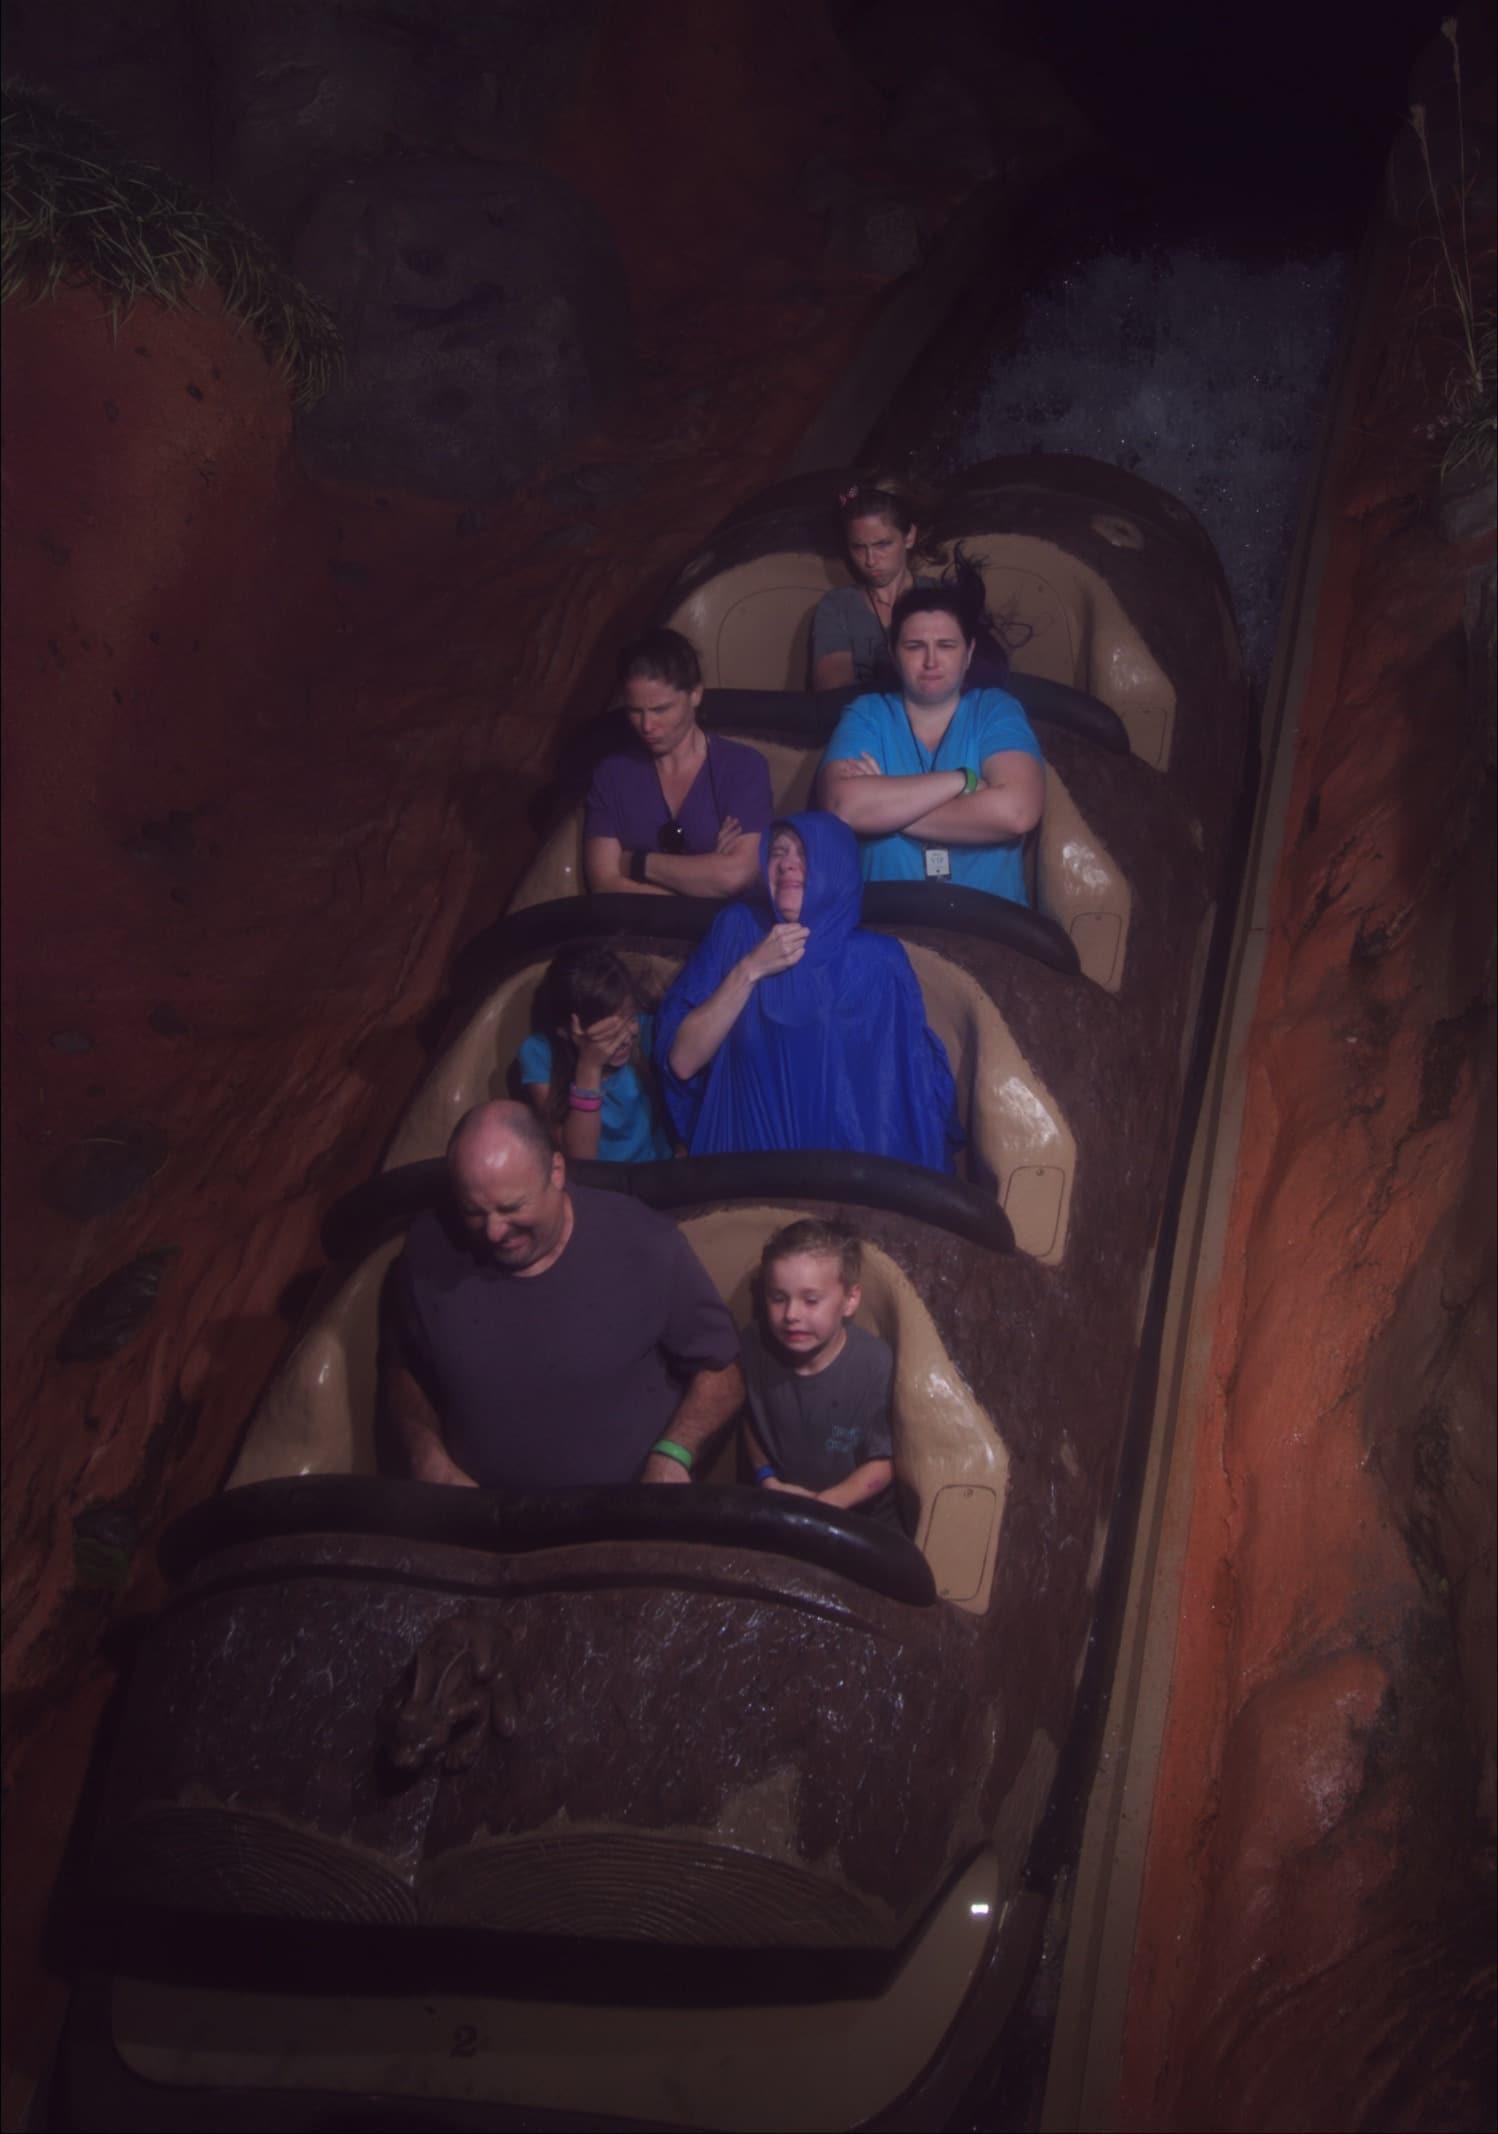 Ultimate Day of Thrills VIP Tour at Walt Disney World